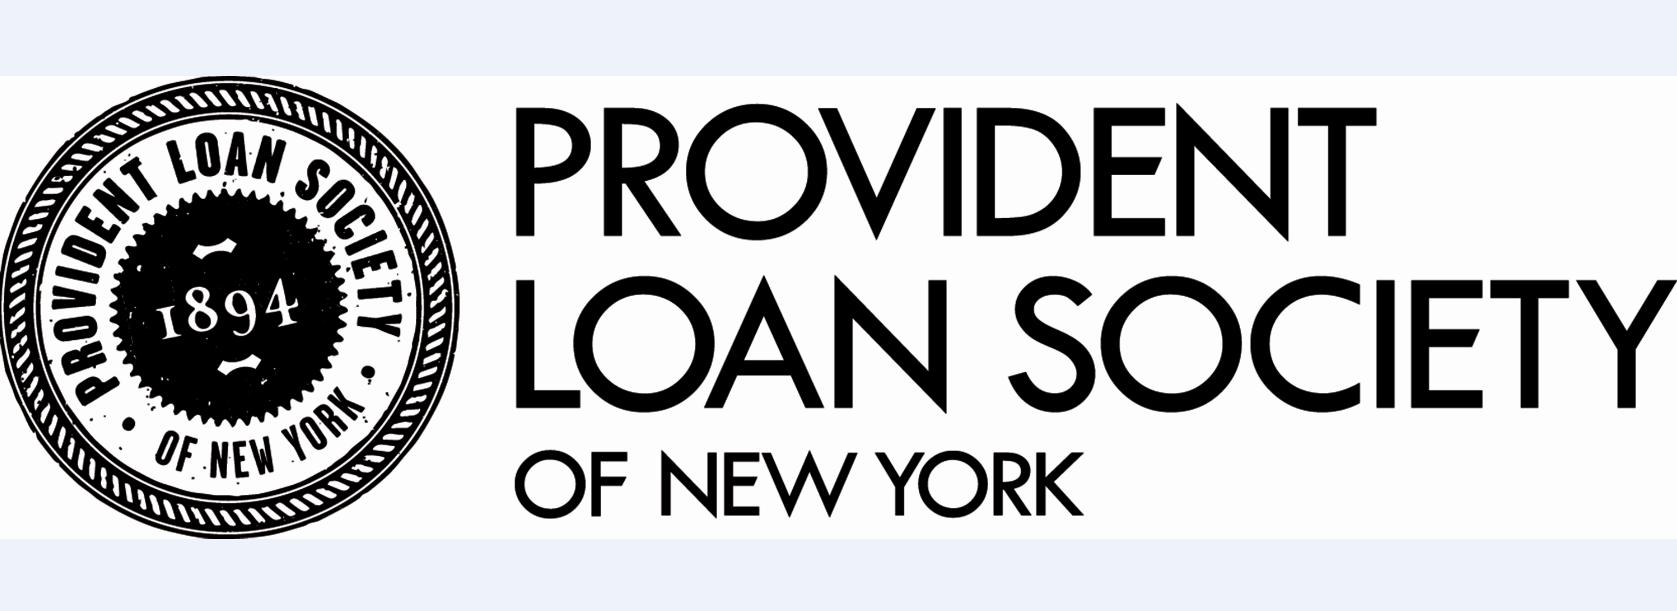 Provident Loan Society: Quick Extra Cash for November